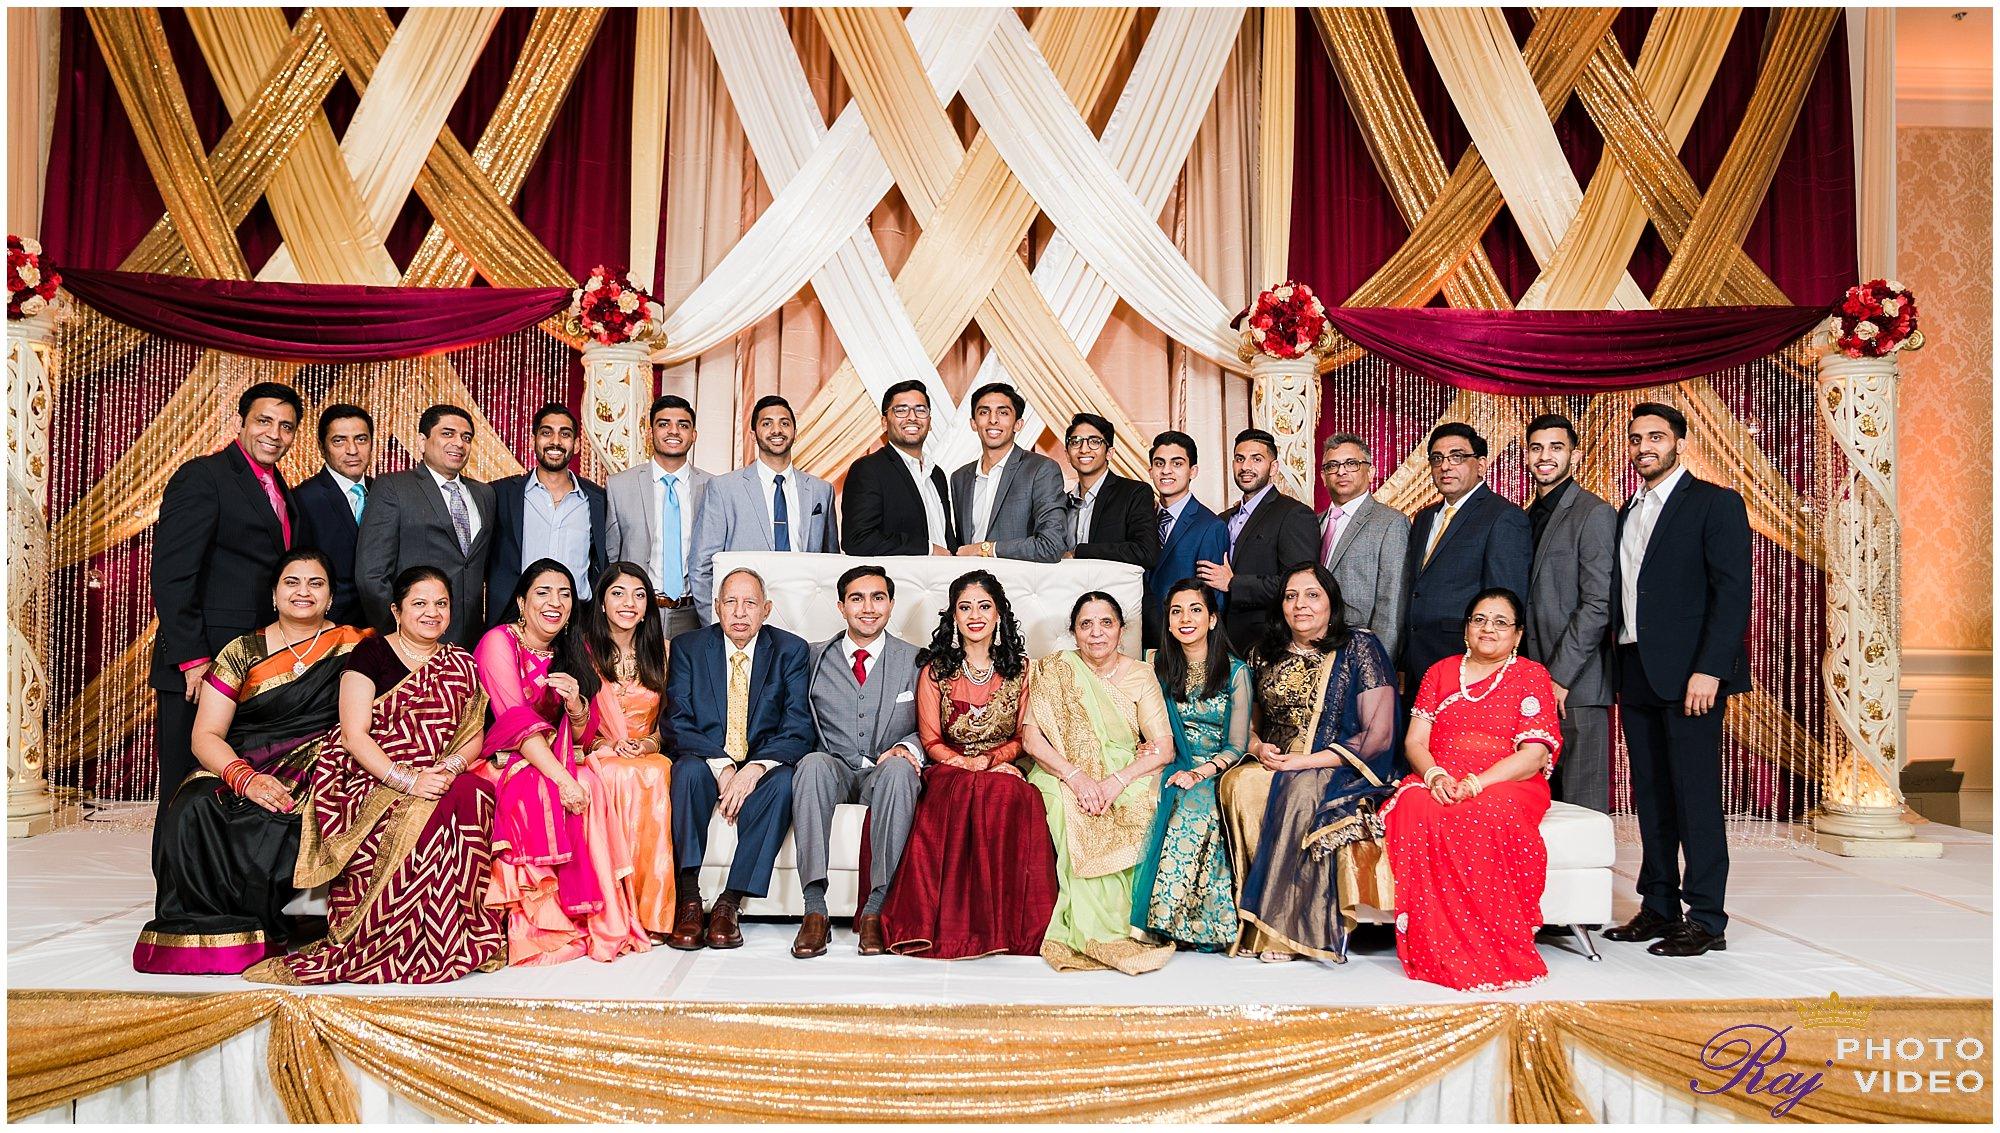 Founders-Inn-and-Spa-Virginia-Beach-VA-Indian-Wedding-Harini-Vivek-90.jpg